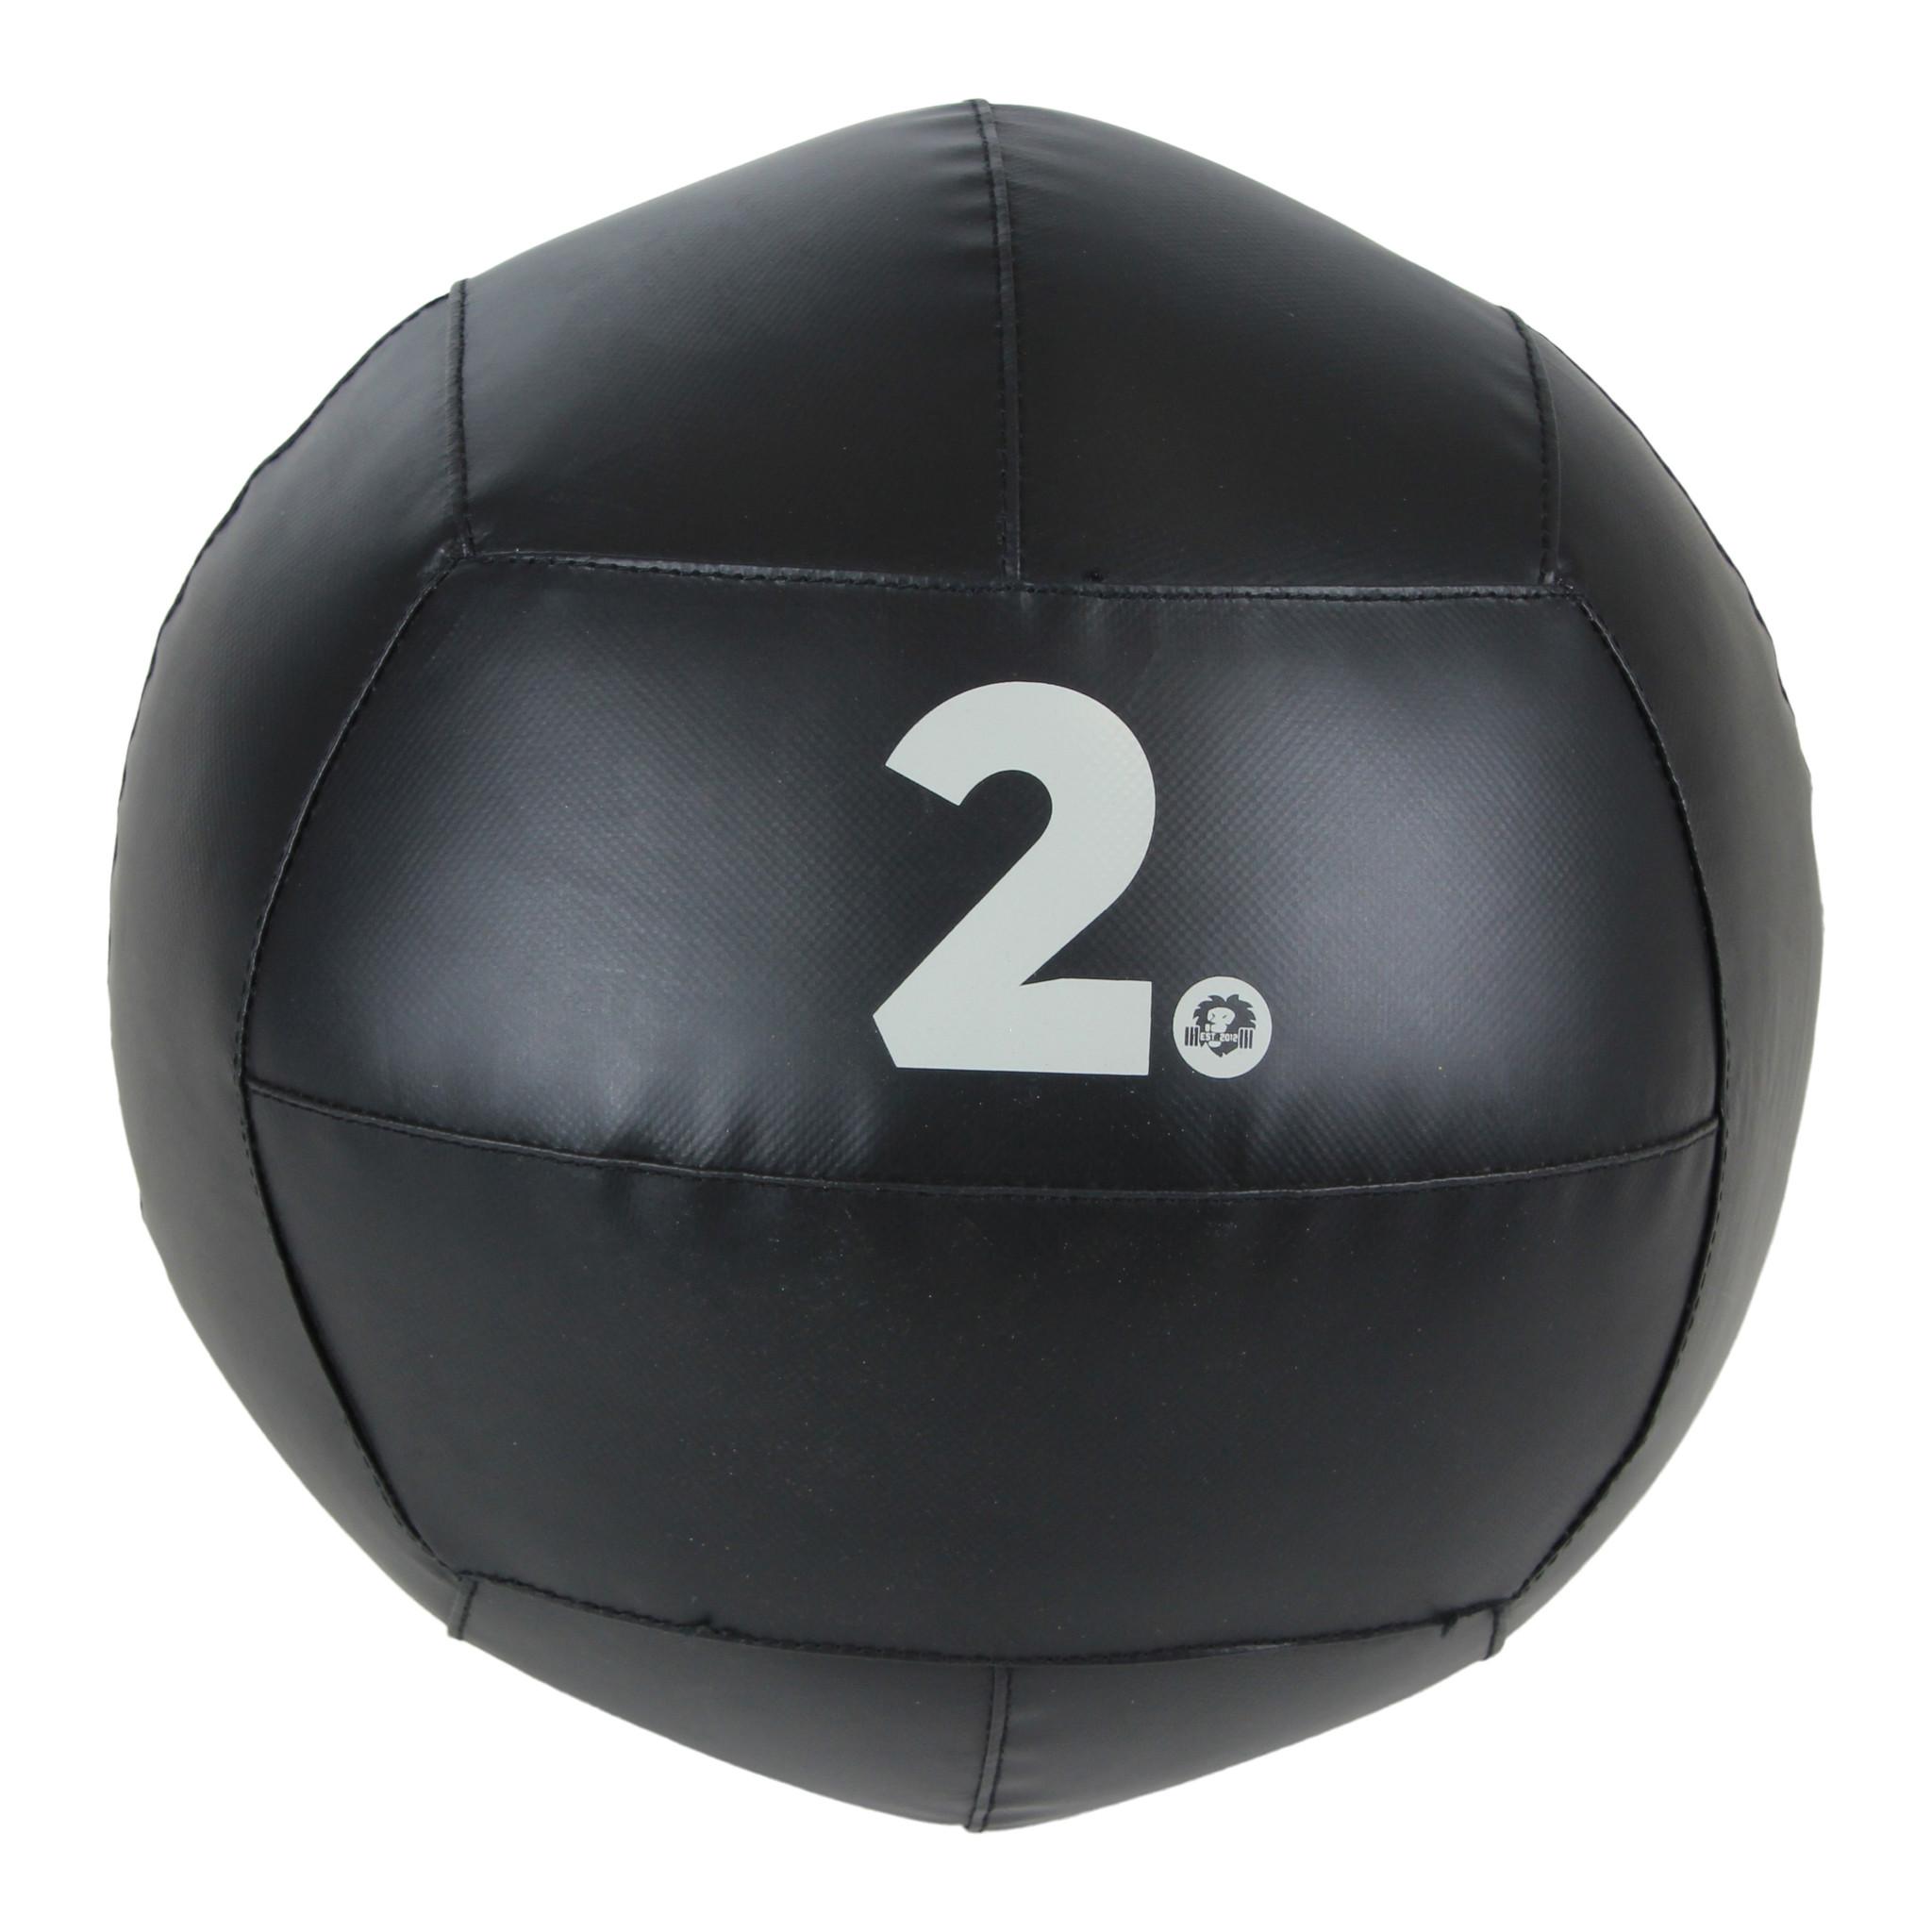 Crossmaxx® LMX1244 Crossmaxx® PRO wall ball (2 - 12kg) (available end of March)